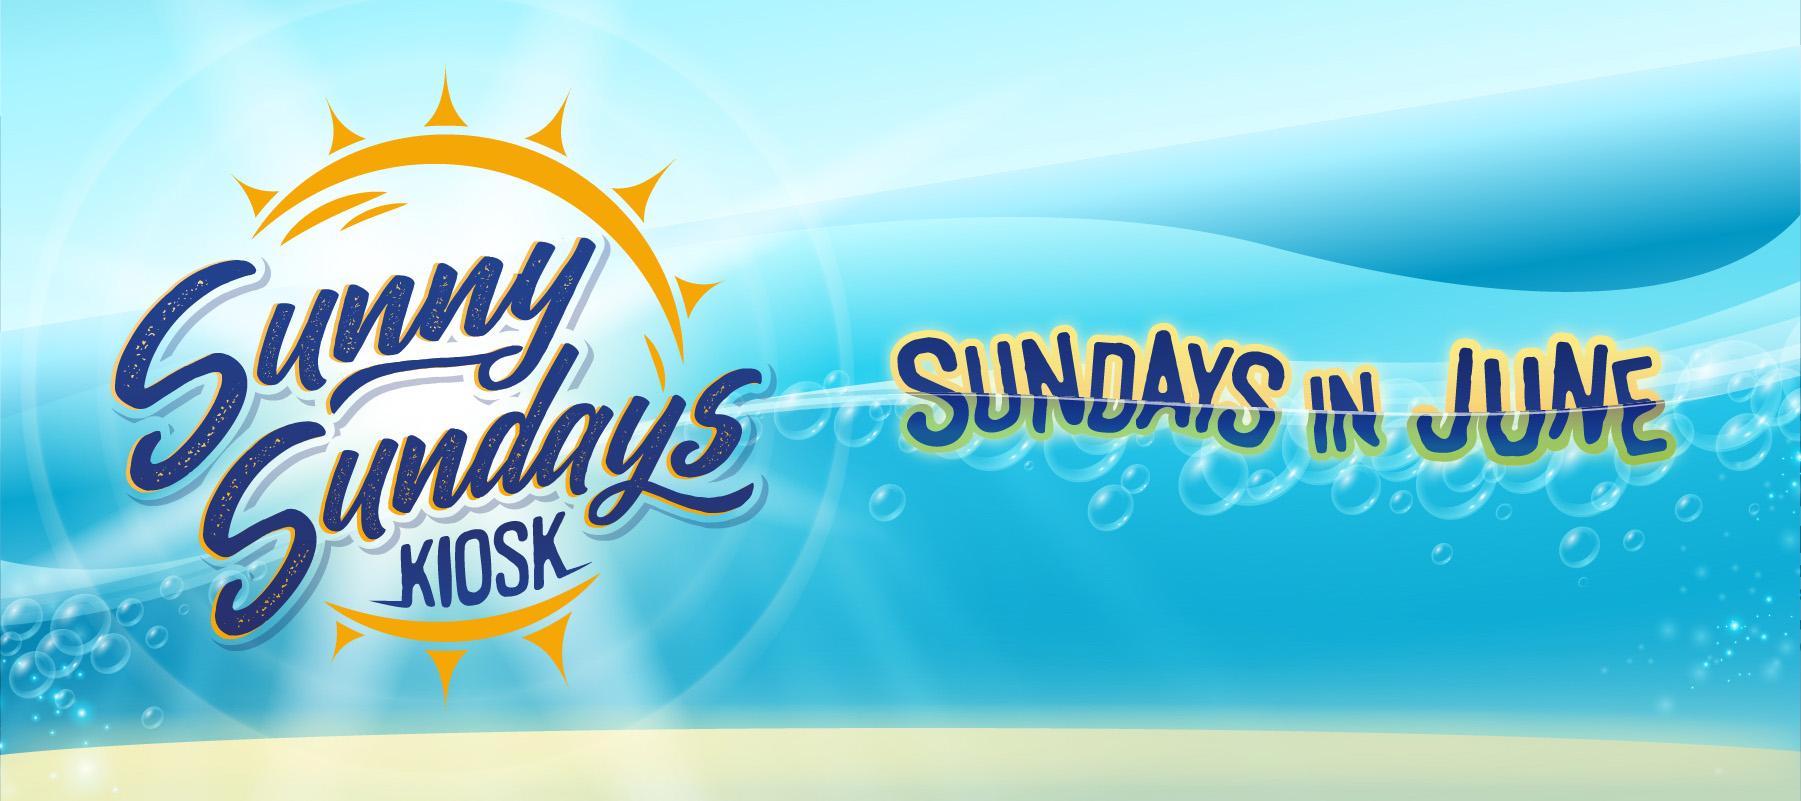 Sunny Sundays Kiosk